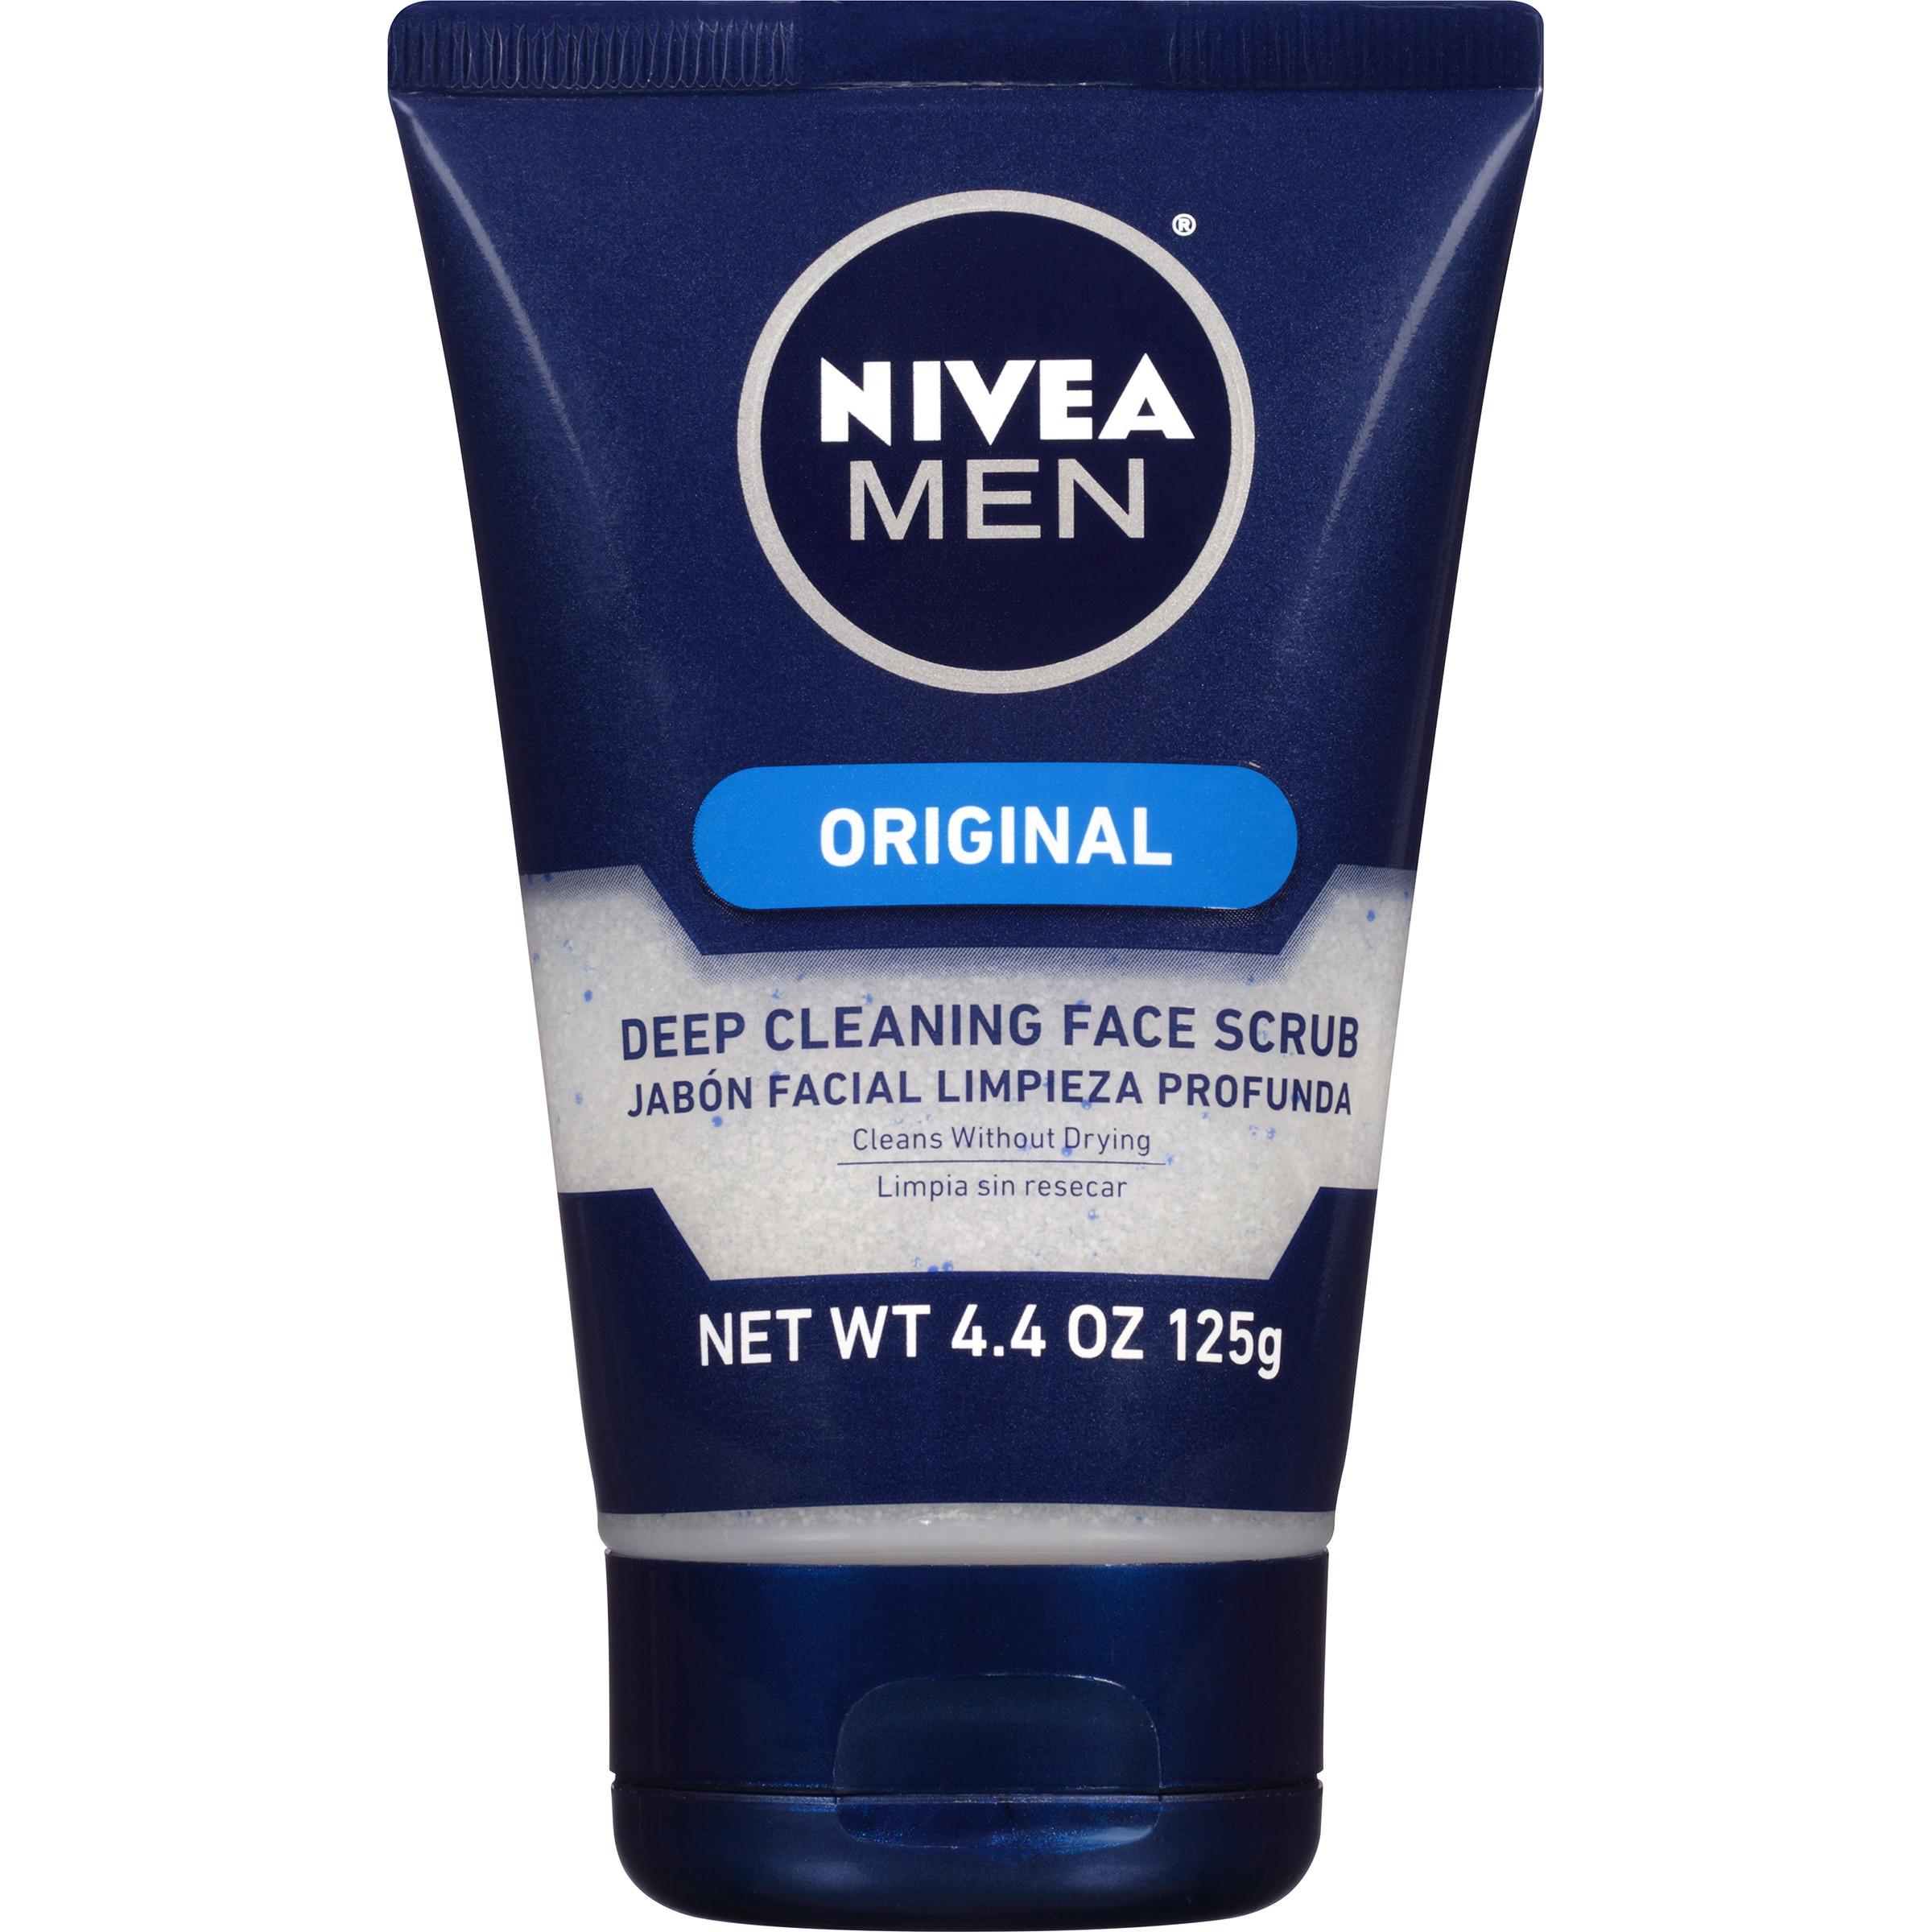 NIVEA Men® Original Deep Cleaning Face Scrub 4.4 oz.